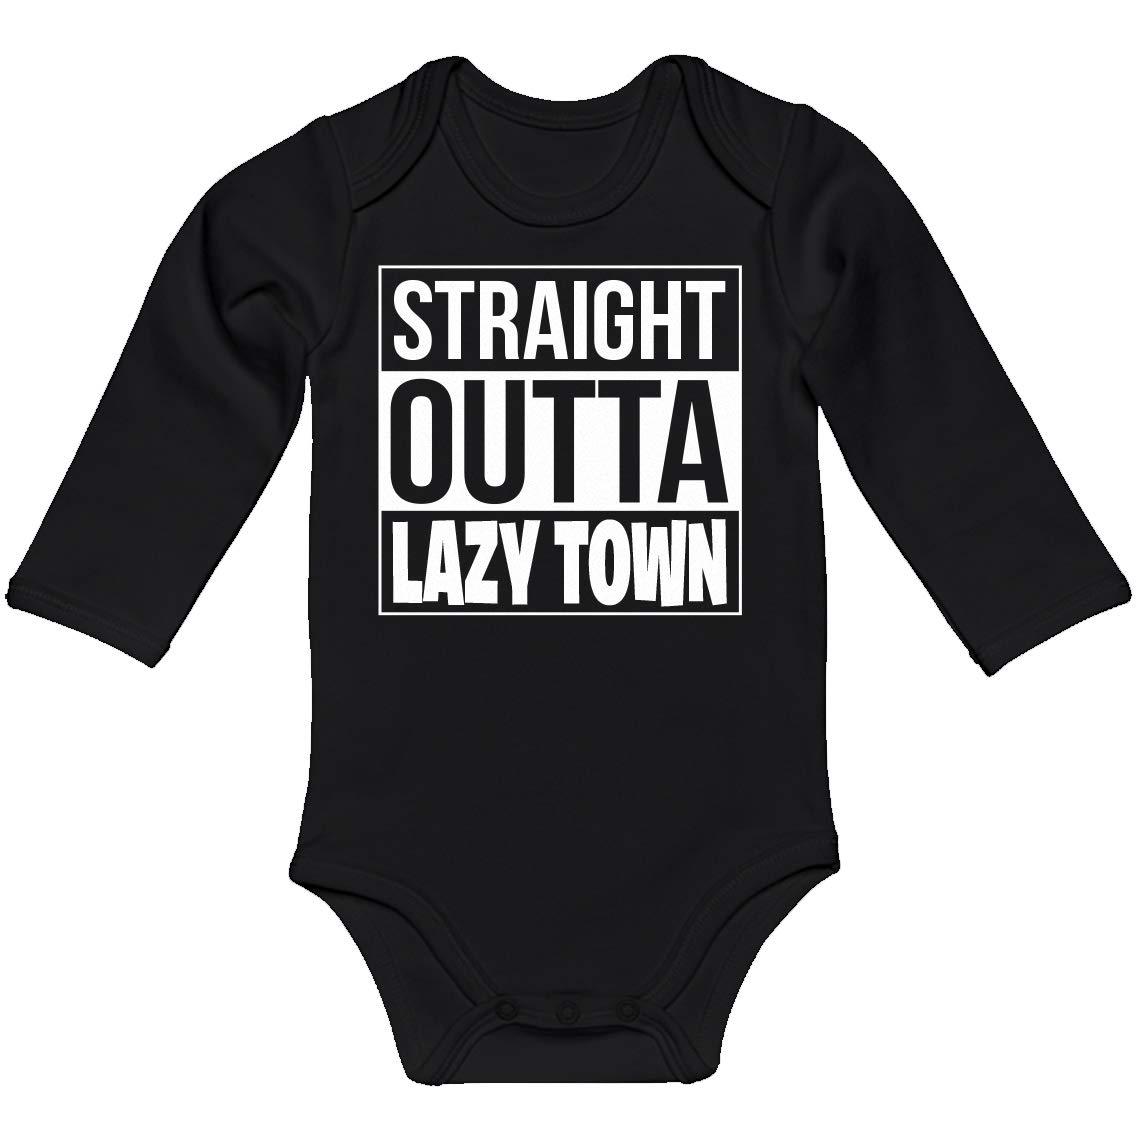 MMSSsJQ6 Canadian Argentina Flag Infant Baby Boys Girls Infant Creeper Sleeveless Rompers Romper Jumpsuit Black